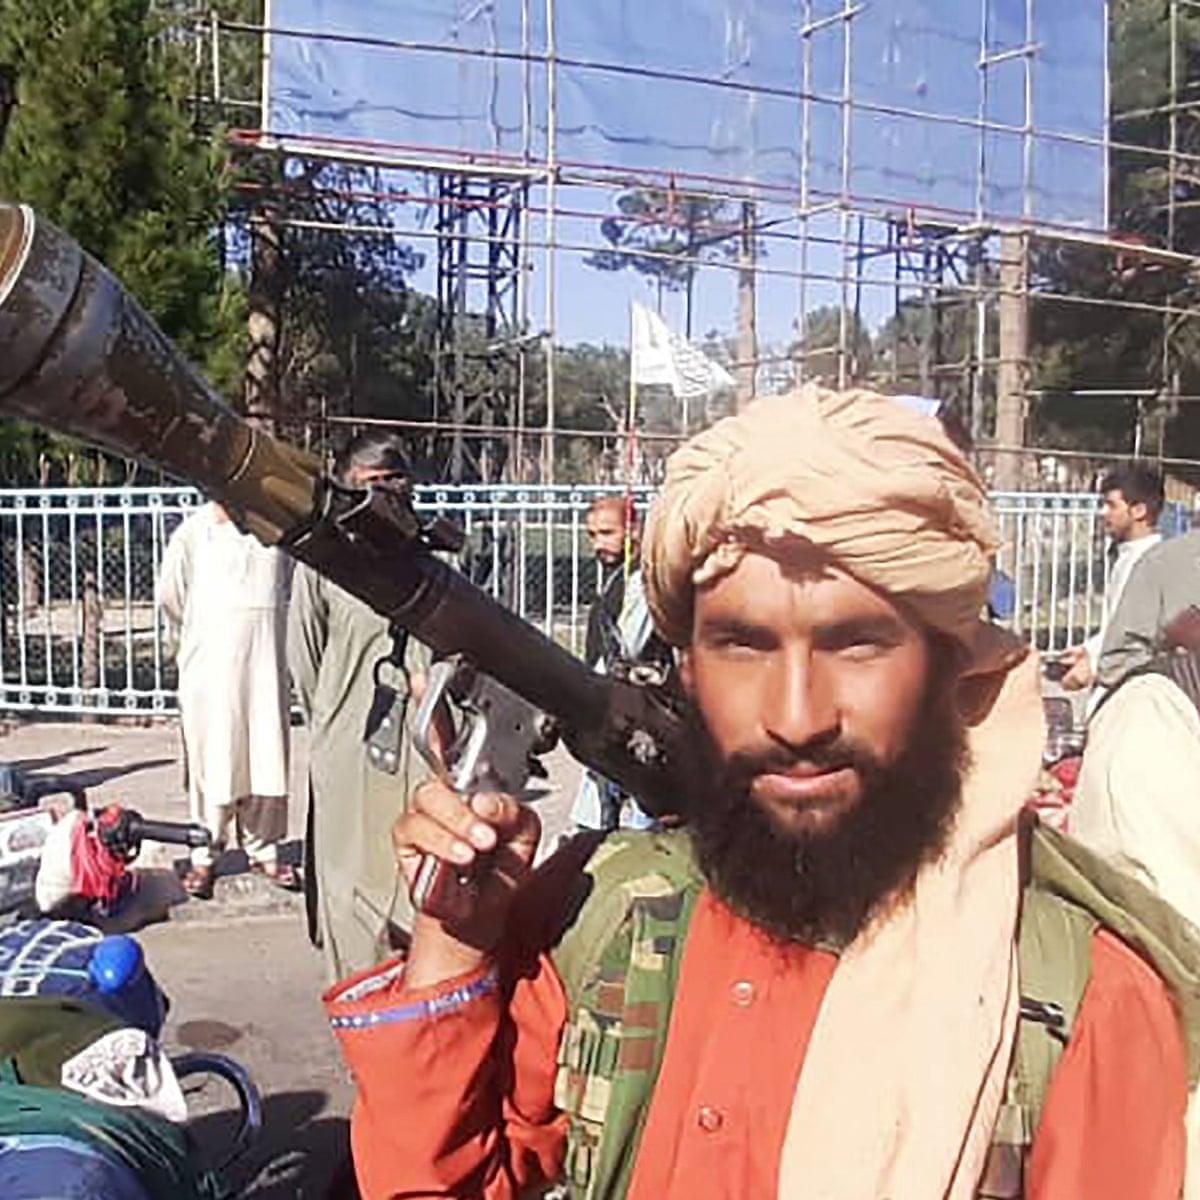 Afghanistan likened to fall of Saigon as officials confirm Taliban take  Kandahar   Afghanistan   The Guardian